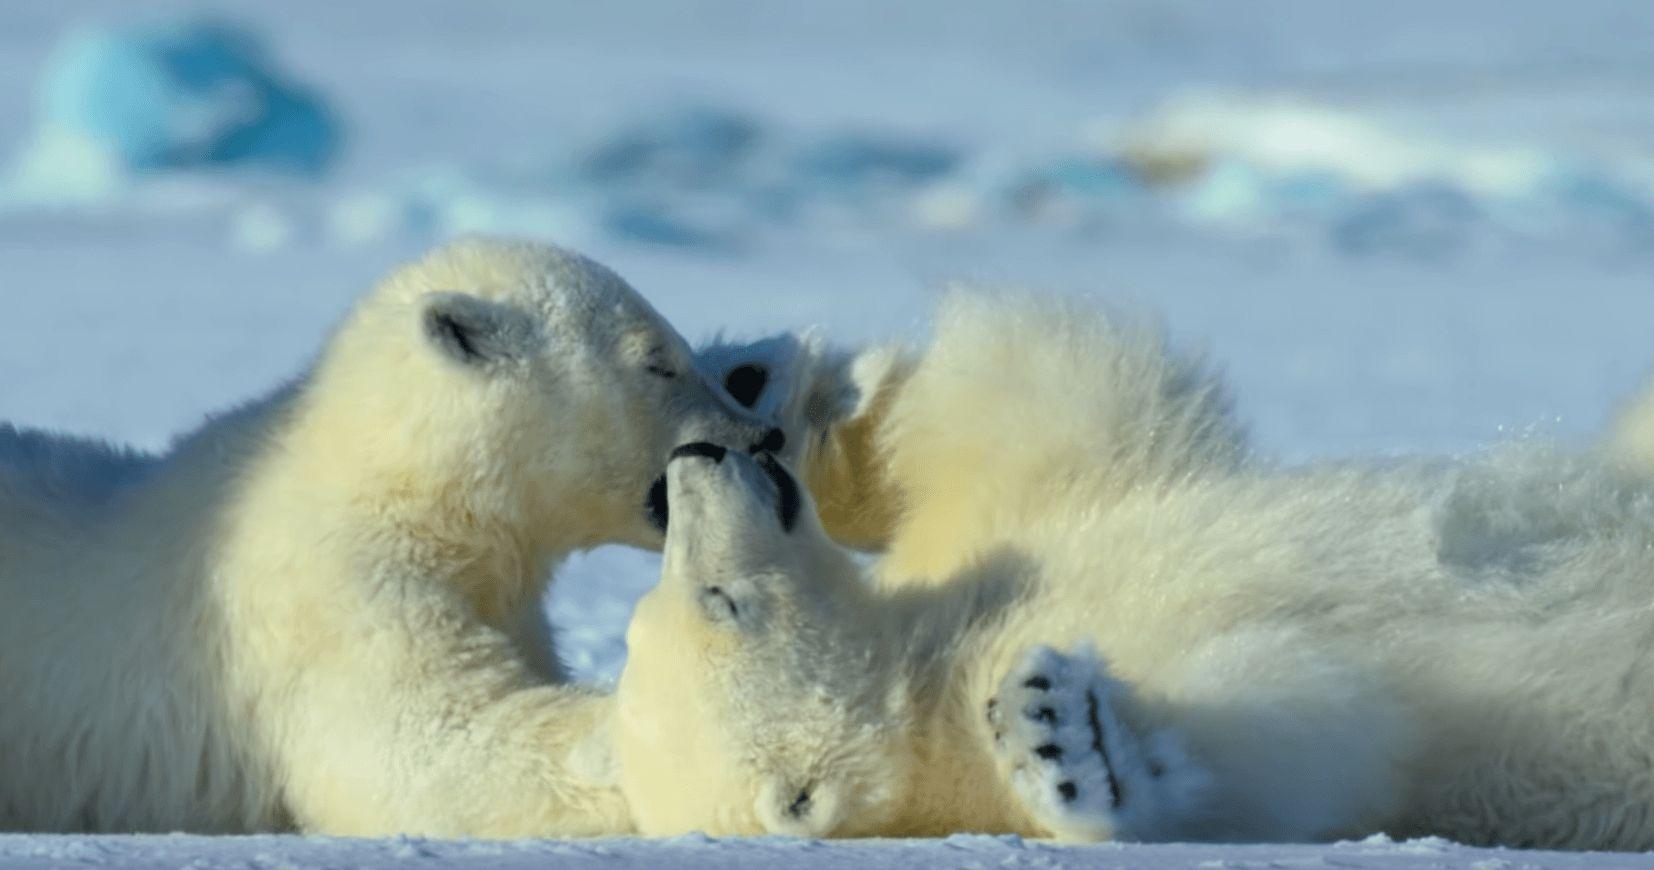 Image may contain: David Attenborough Netflix series, David Attenborough, Netflix, Our Planet, release date, trailer, Mammal, Wildlife, Animal, Bear, Polar Bear